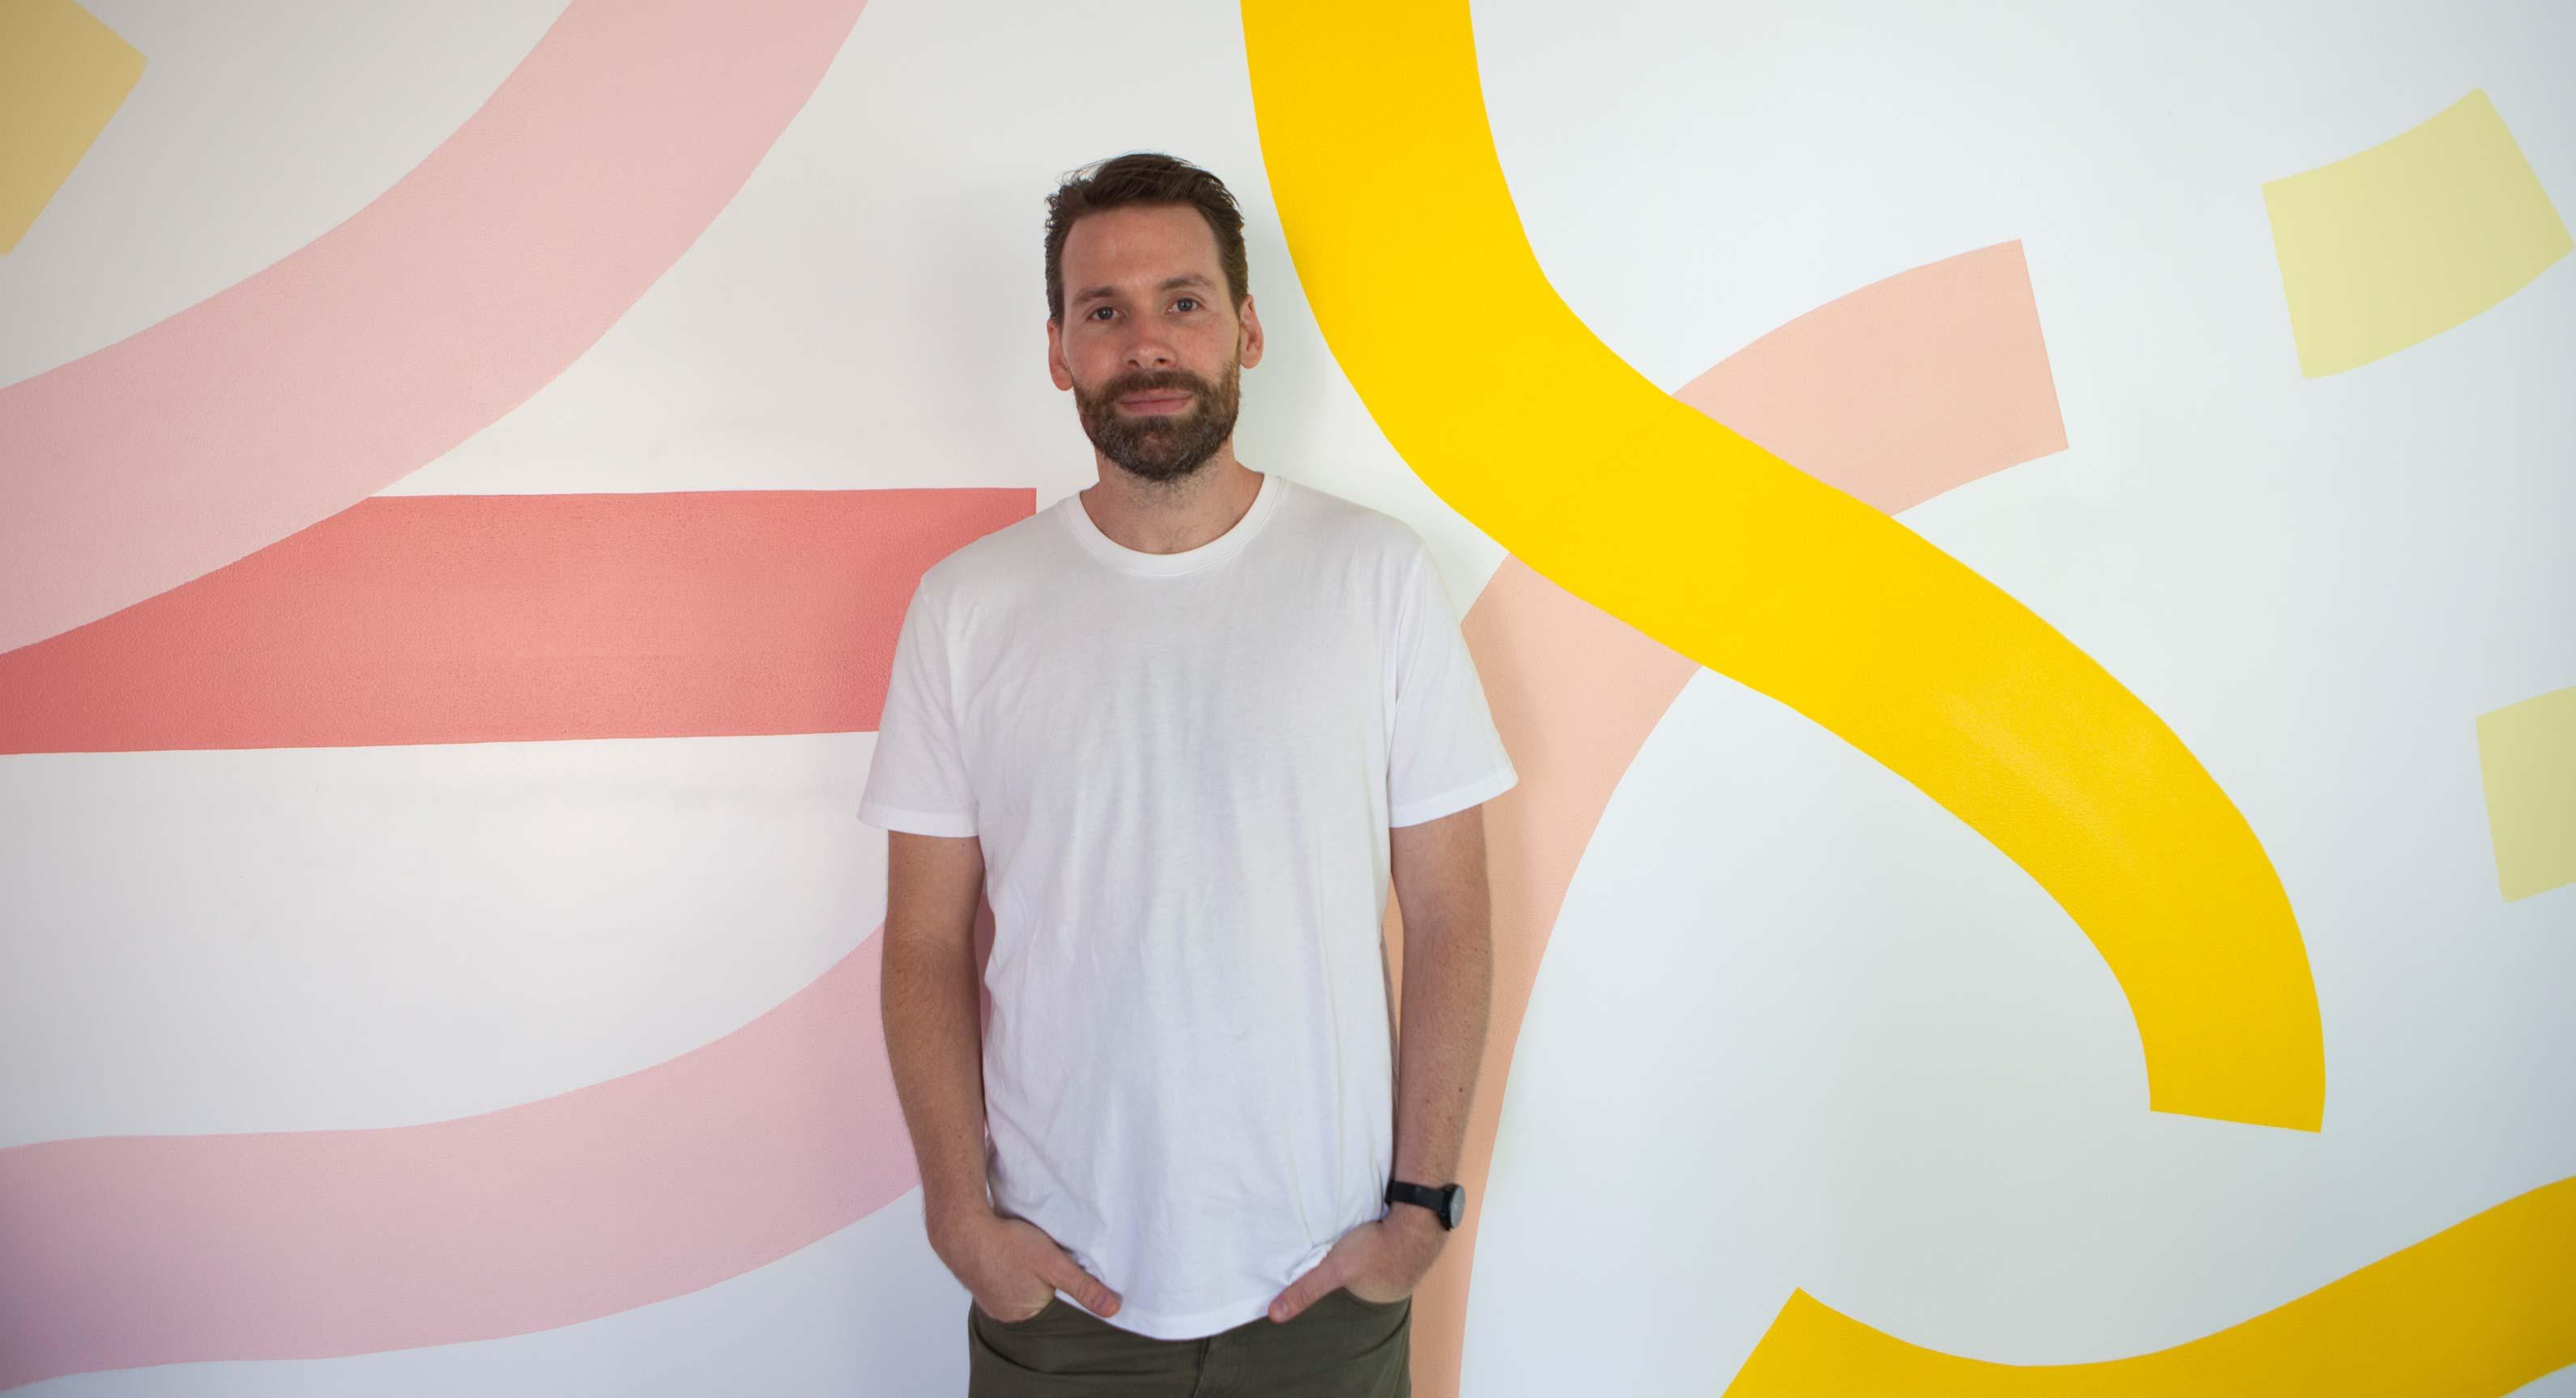 OPUMO Entrepreneurs: Marc Hendrick, Founder of Slowdown Studio